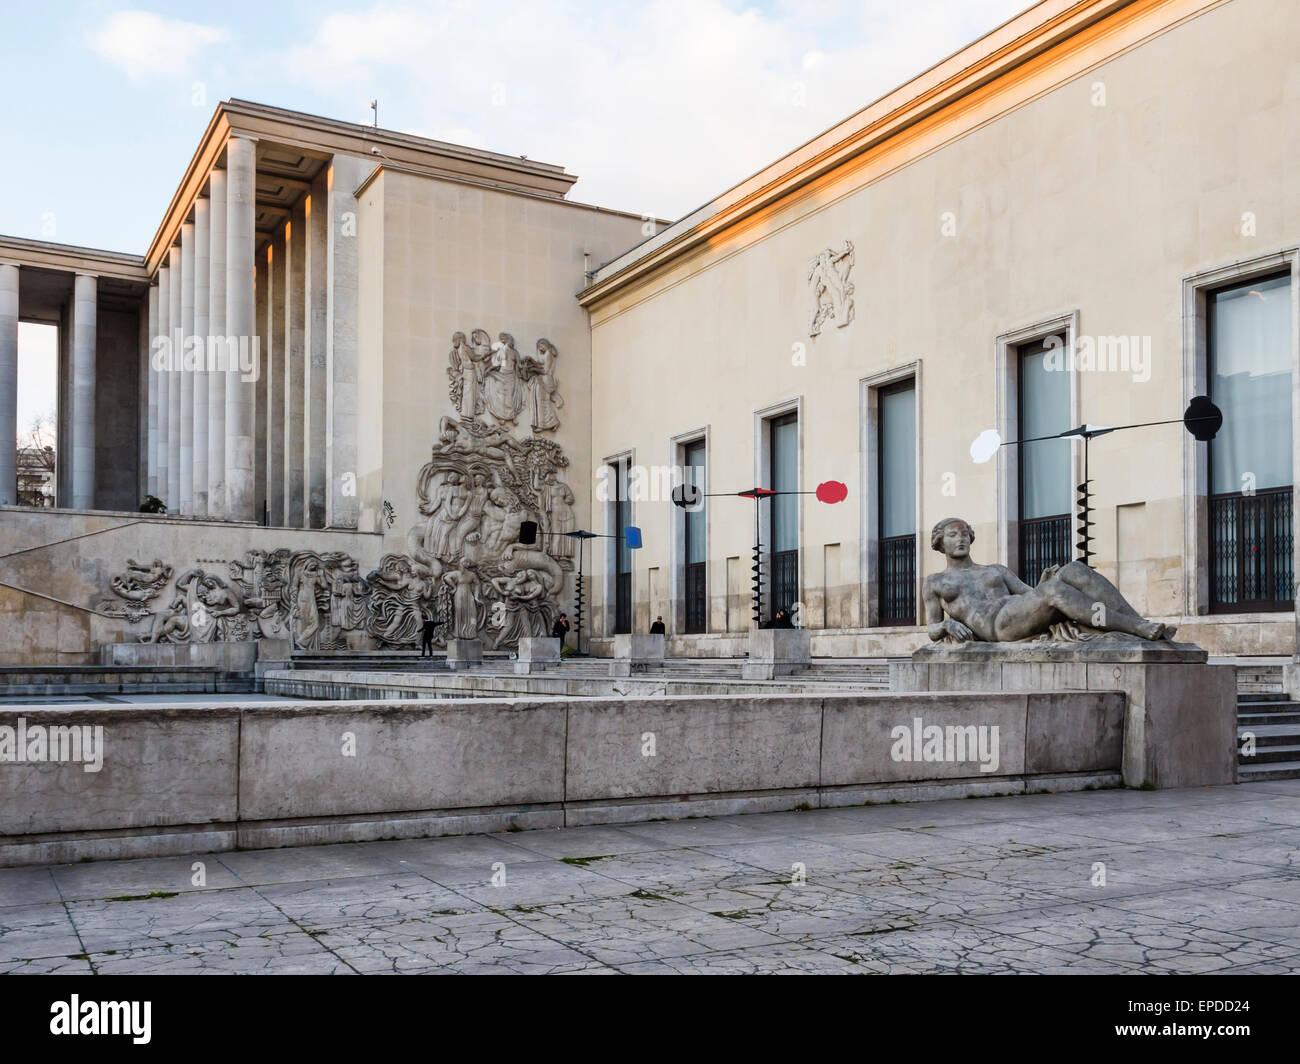 Musee d 39 art moderne de la ville de paris museum of modern art stock photo royalty free image - Musee d art moderne strasbourg ...